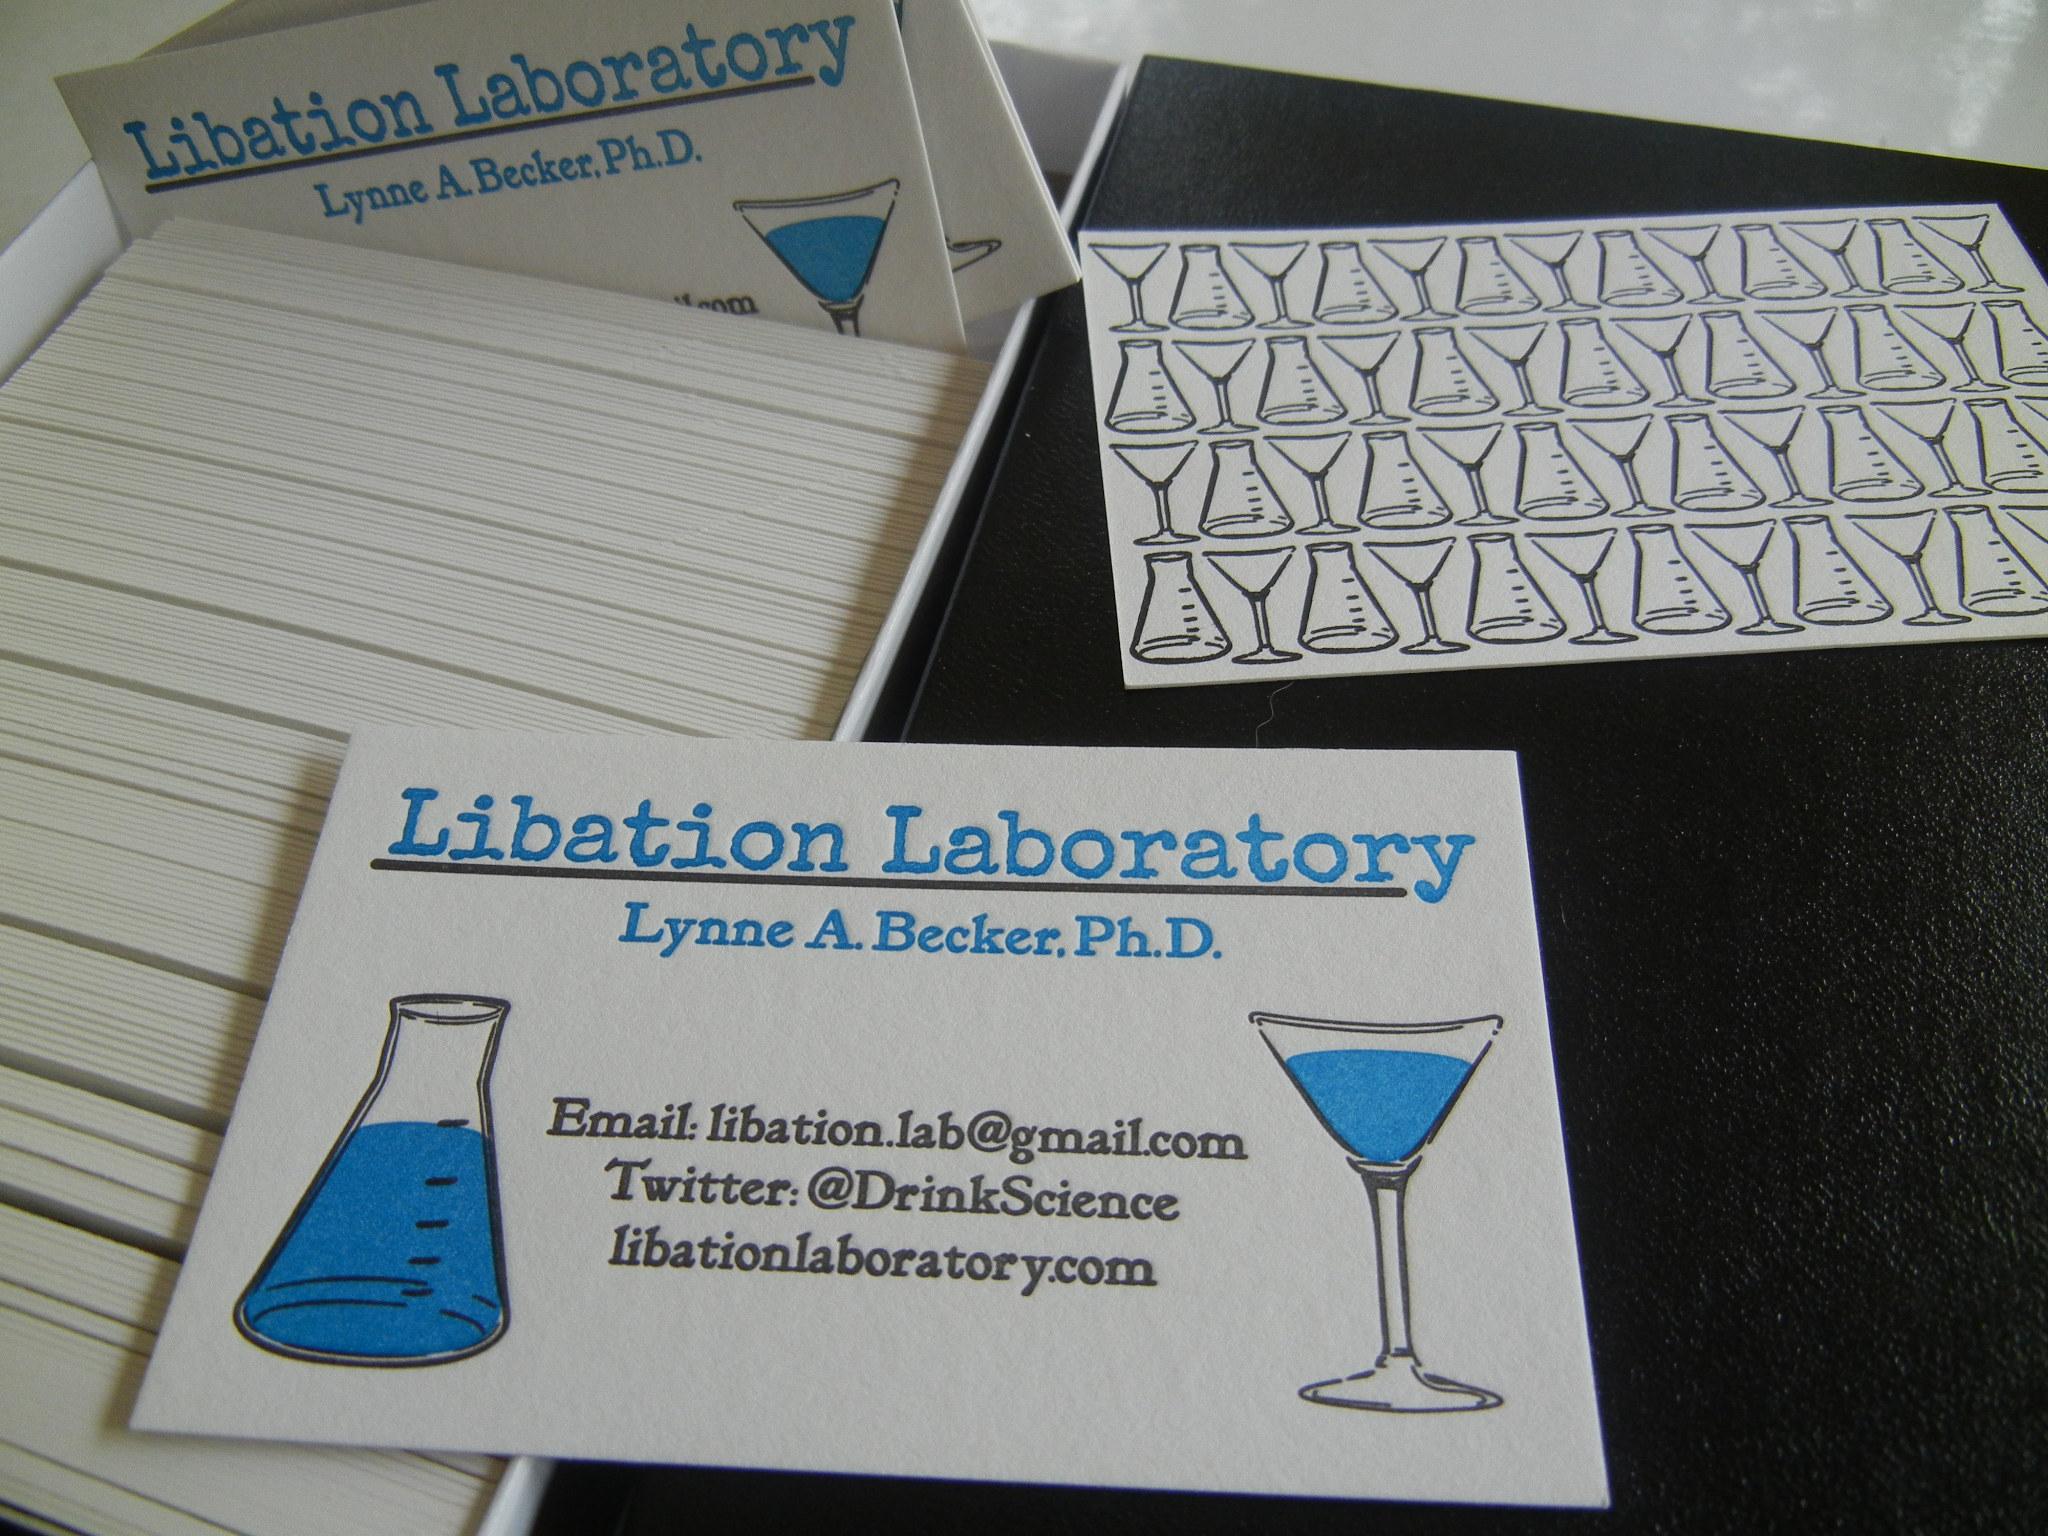 business card | Libation Laboratory